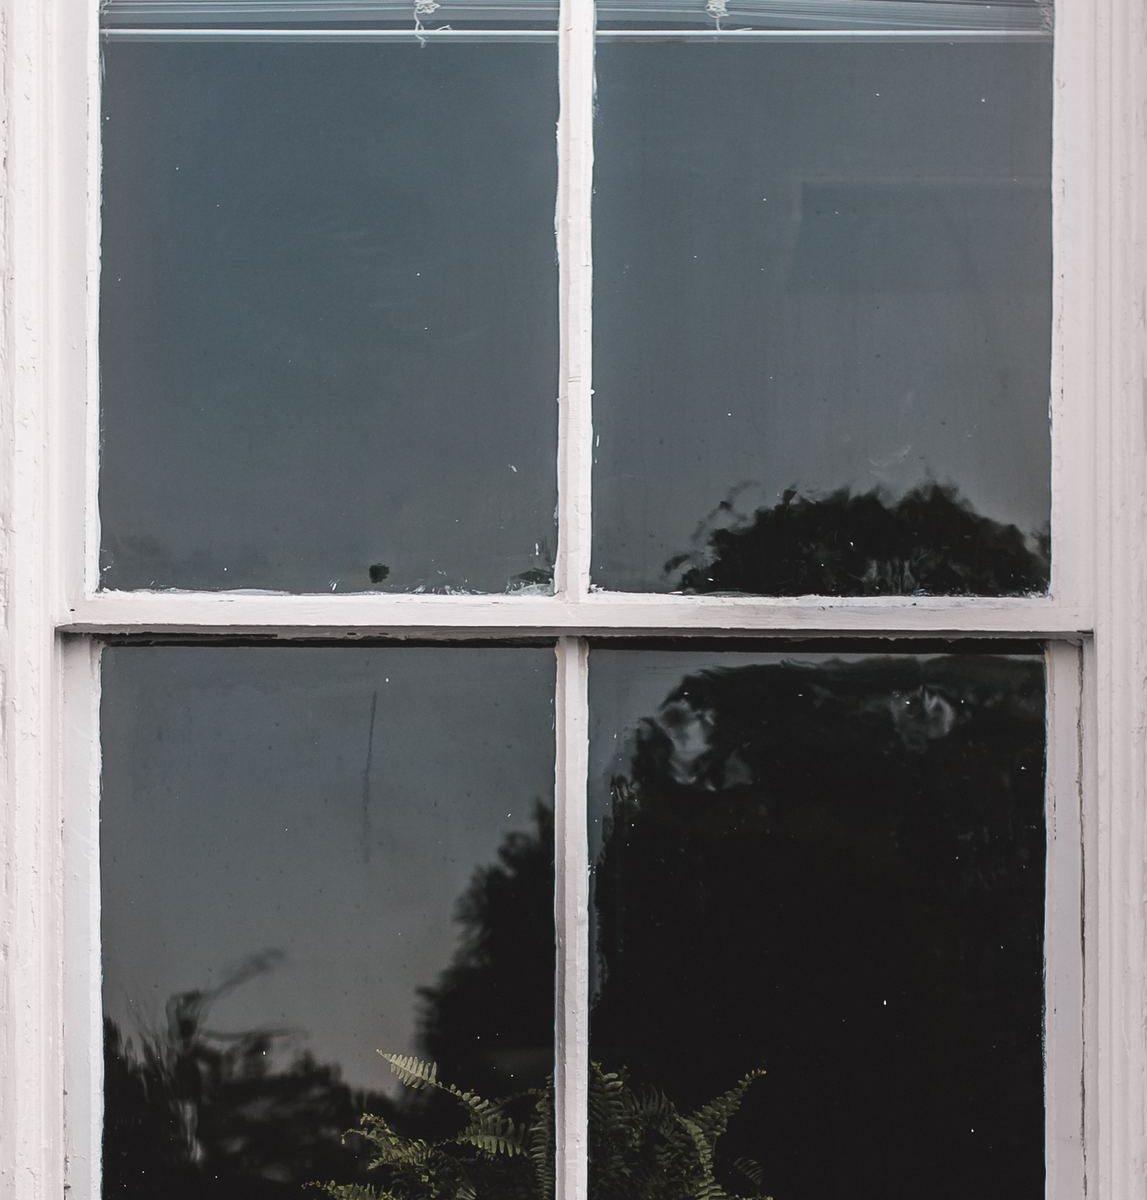 Nye vinduer? Bliv klogere online